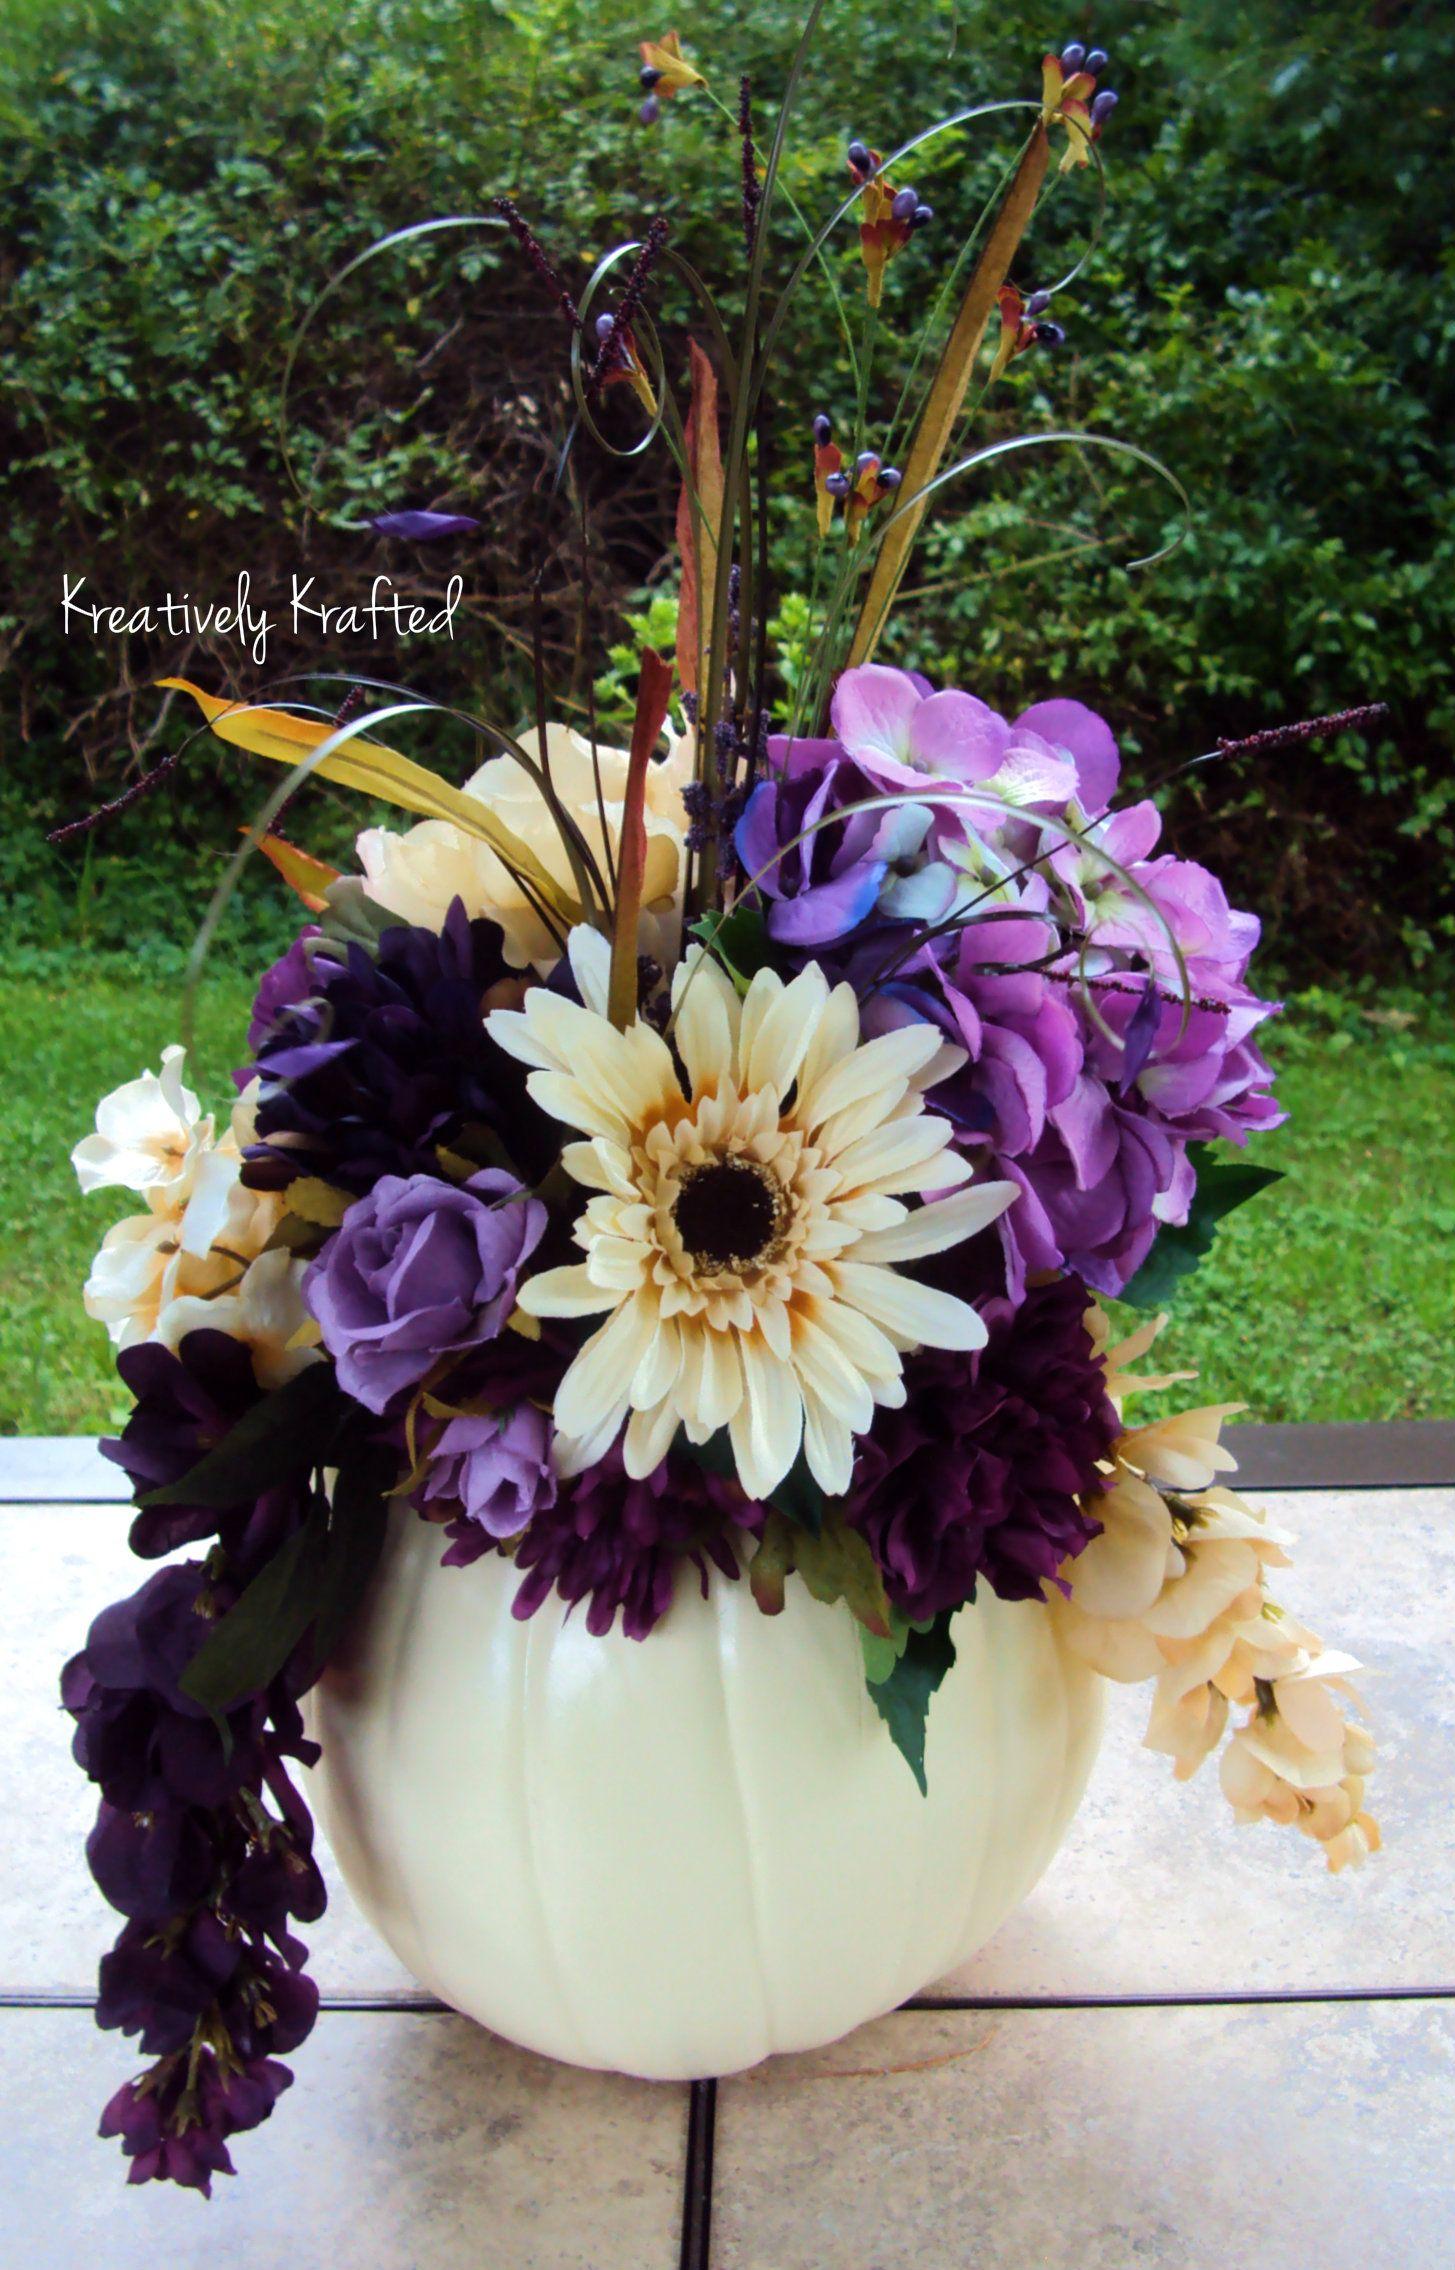 White pumpkin filled with plum purple cream colored